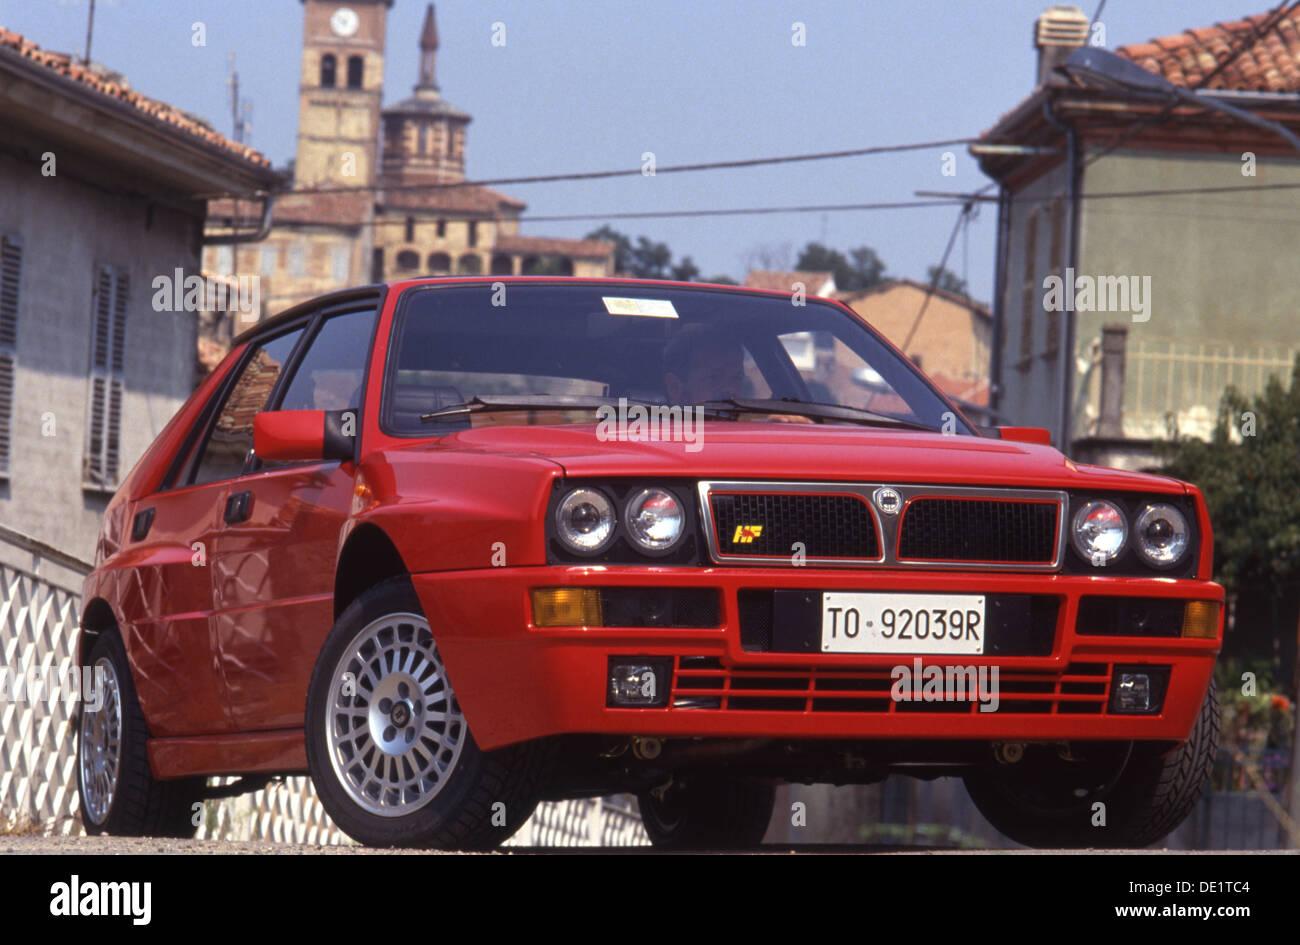 lancia delta integrale hf sports car 4x4 4wd 1990s in red swiss